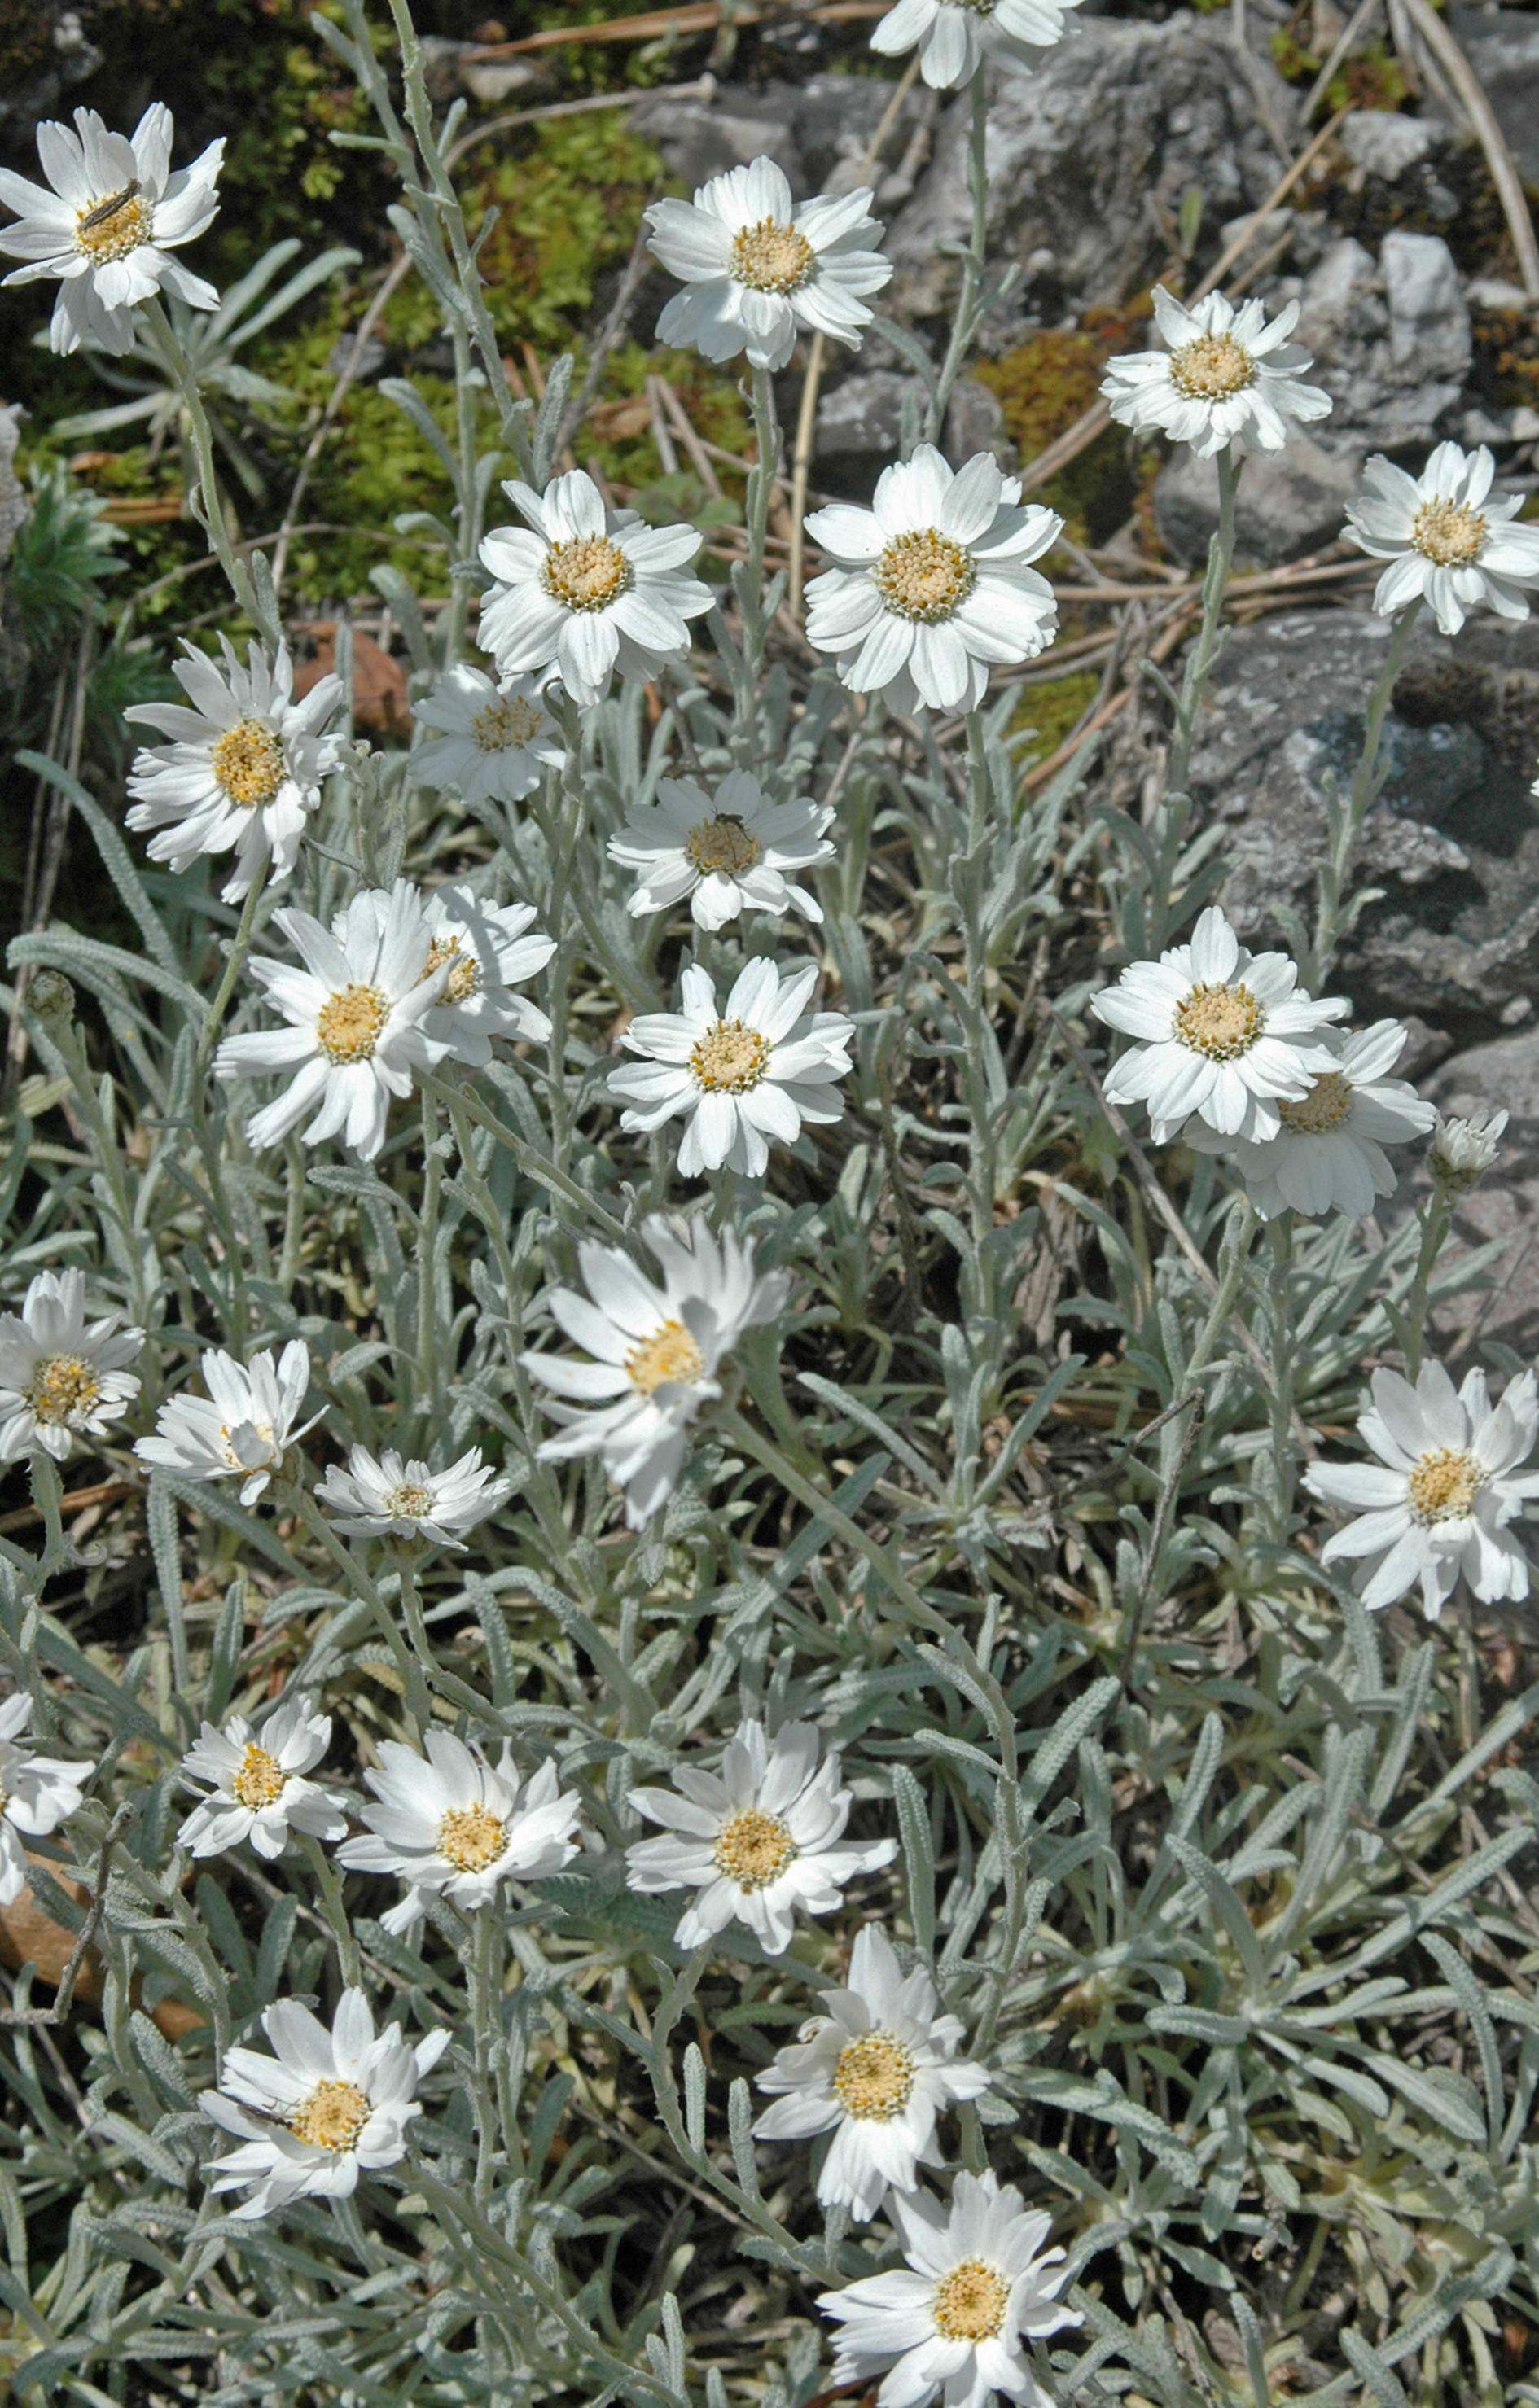 https://media.e-taxonomy.eu/flora-greece/large/Plate_03/AchilleaAgeratifolia18.jpg